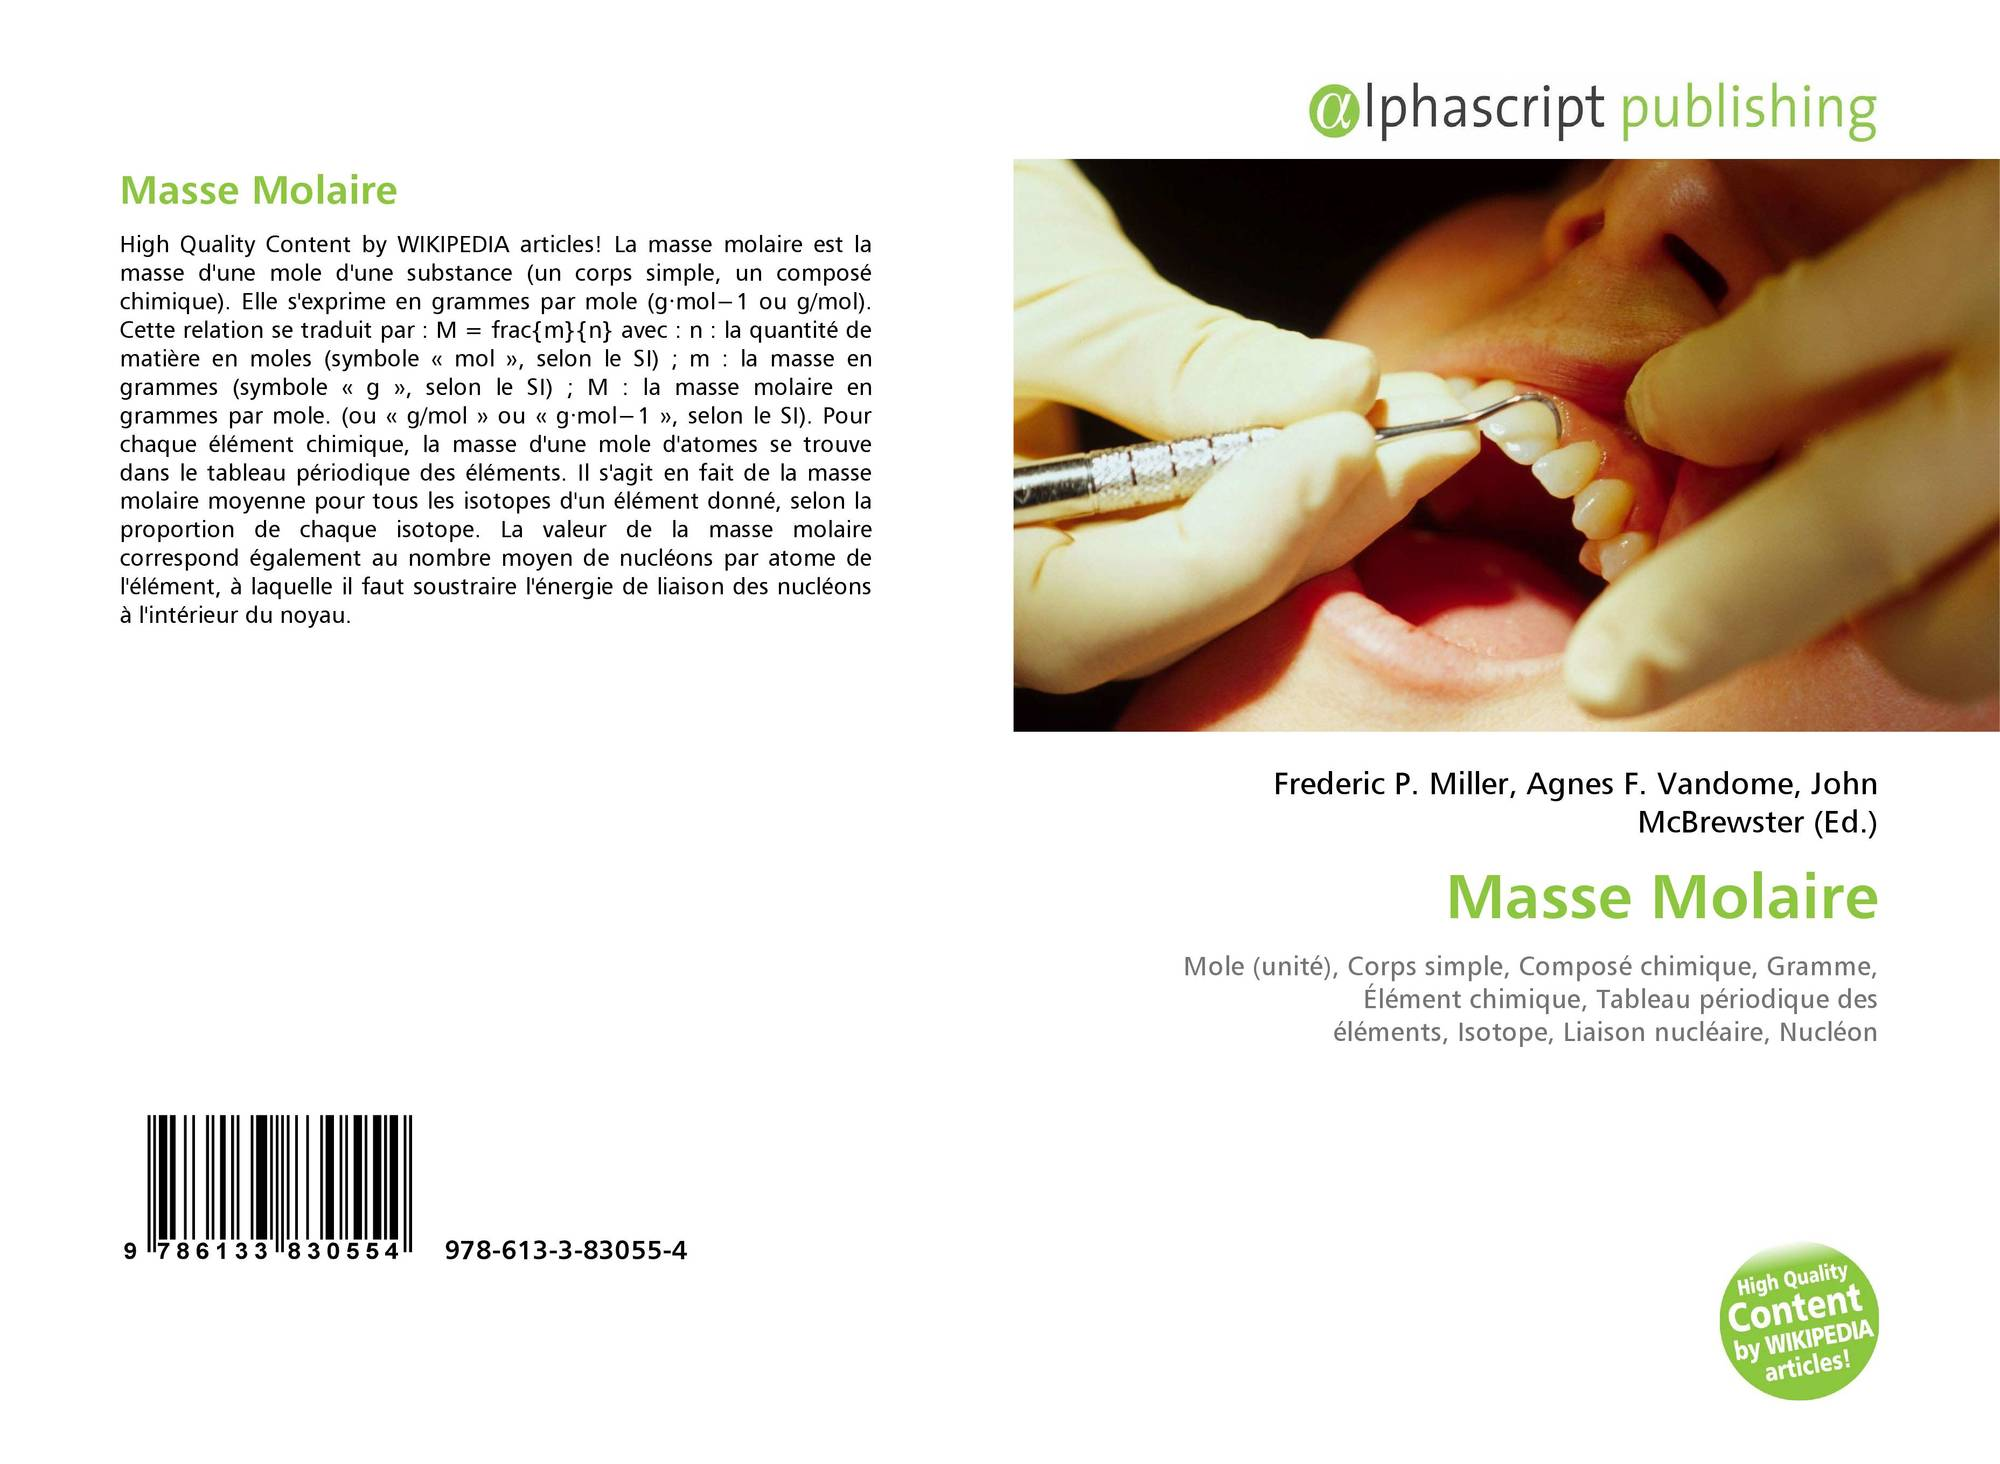 Masse Molaire 978 613 3 83055 4 6133830557 9786133830554